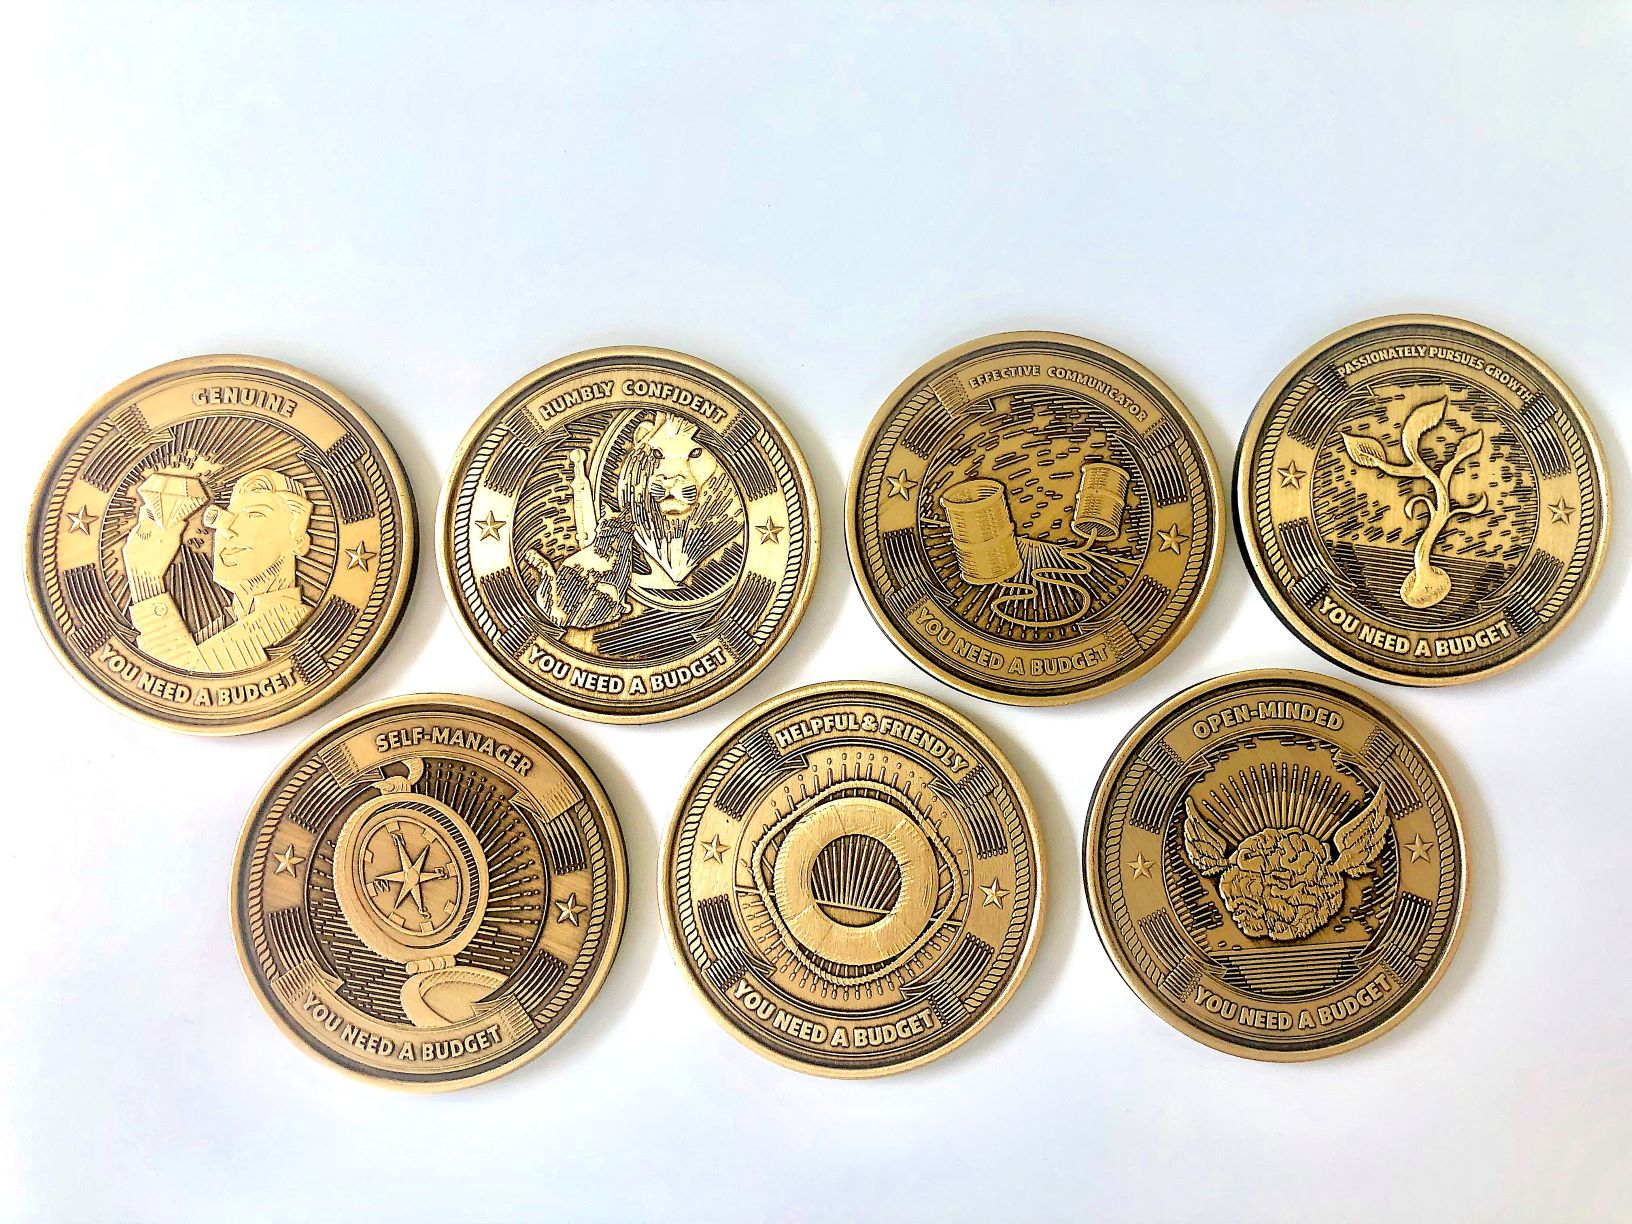 YNAB recognizes employees with custom medallions